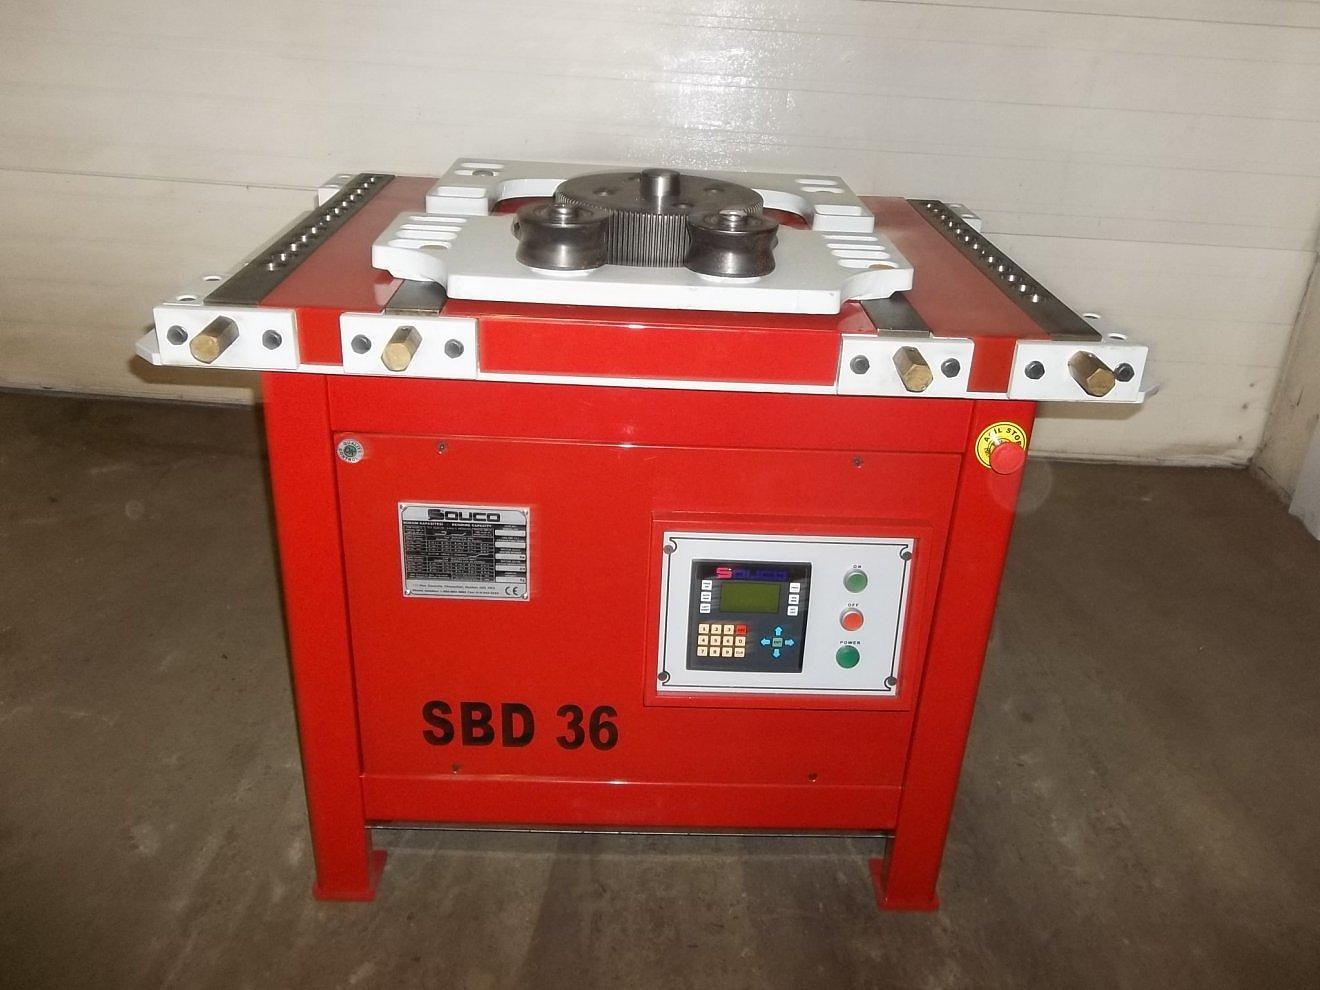 Sbd 36